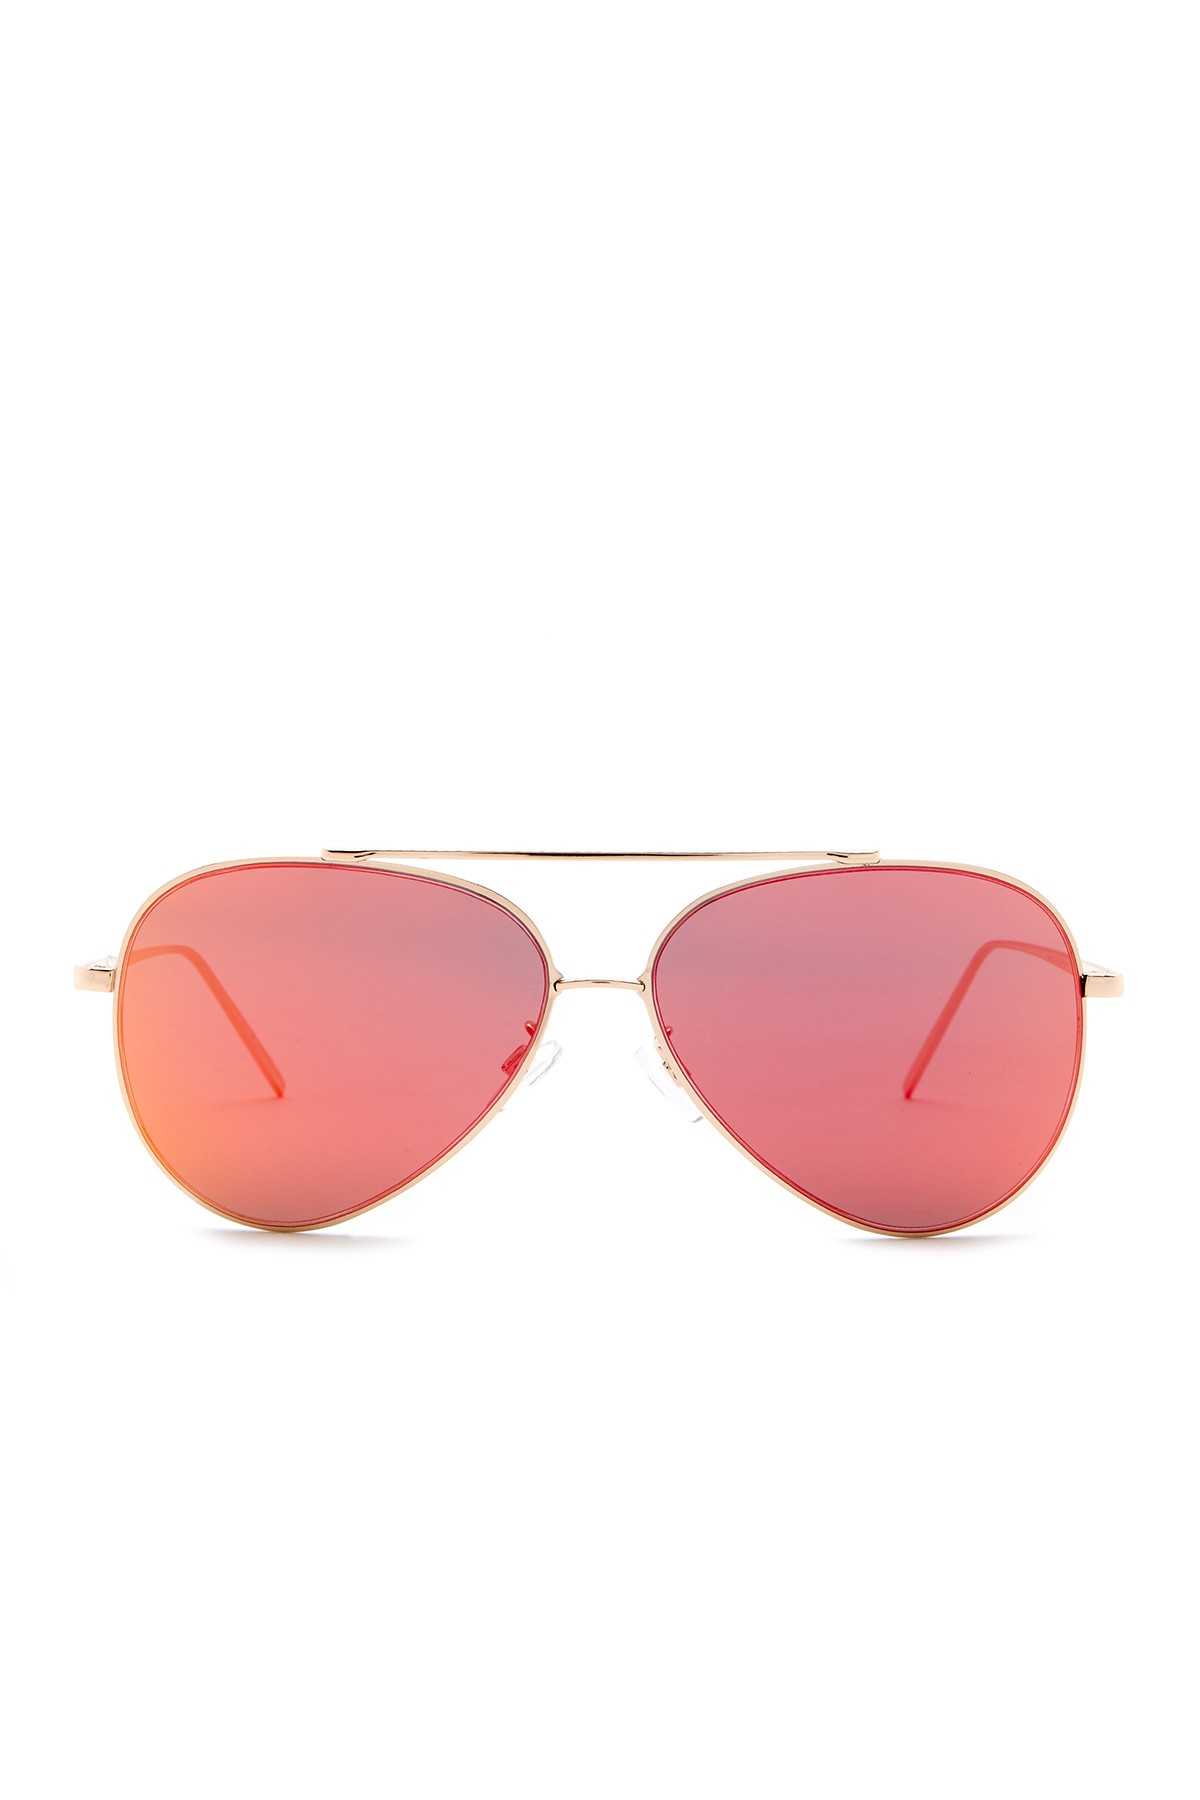 3fc18001c053a Aviator Sunglasses Steve Madden   City of Kenmore, Washington